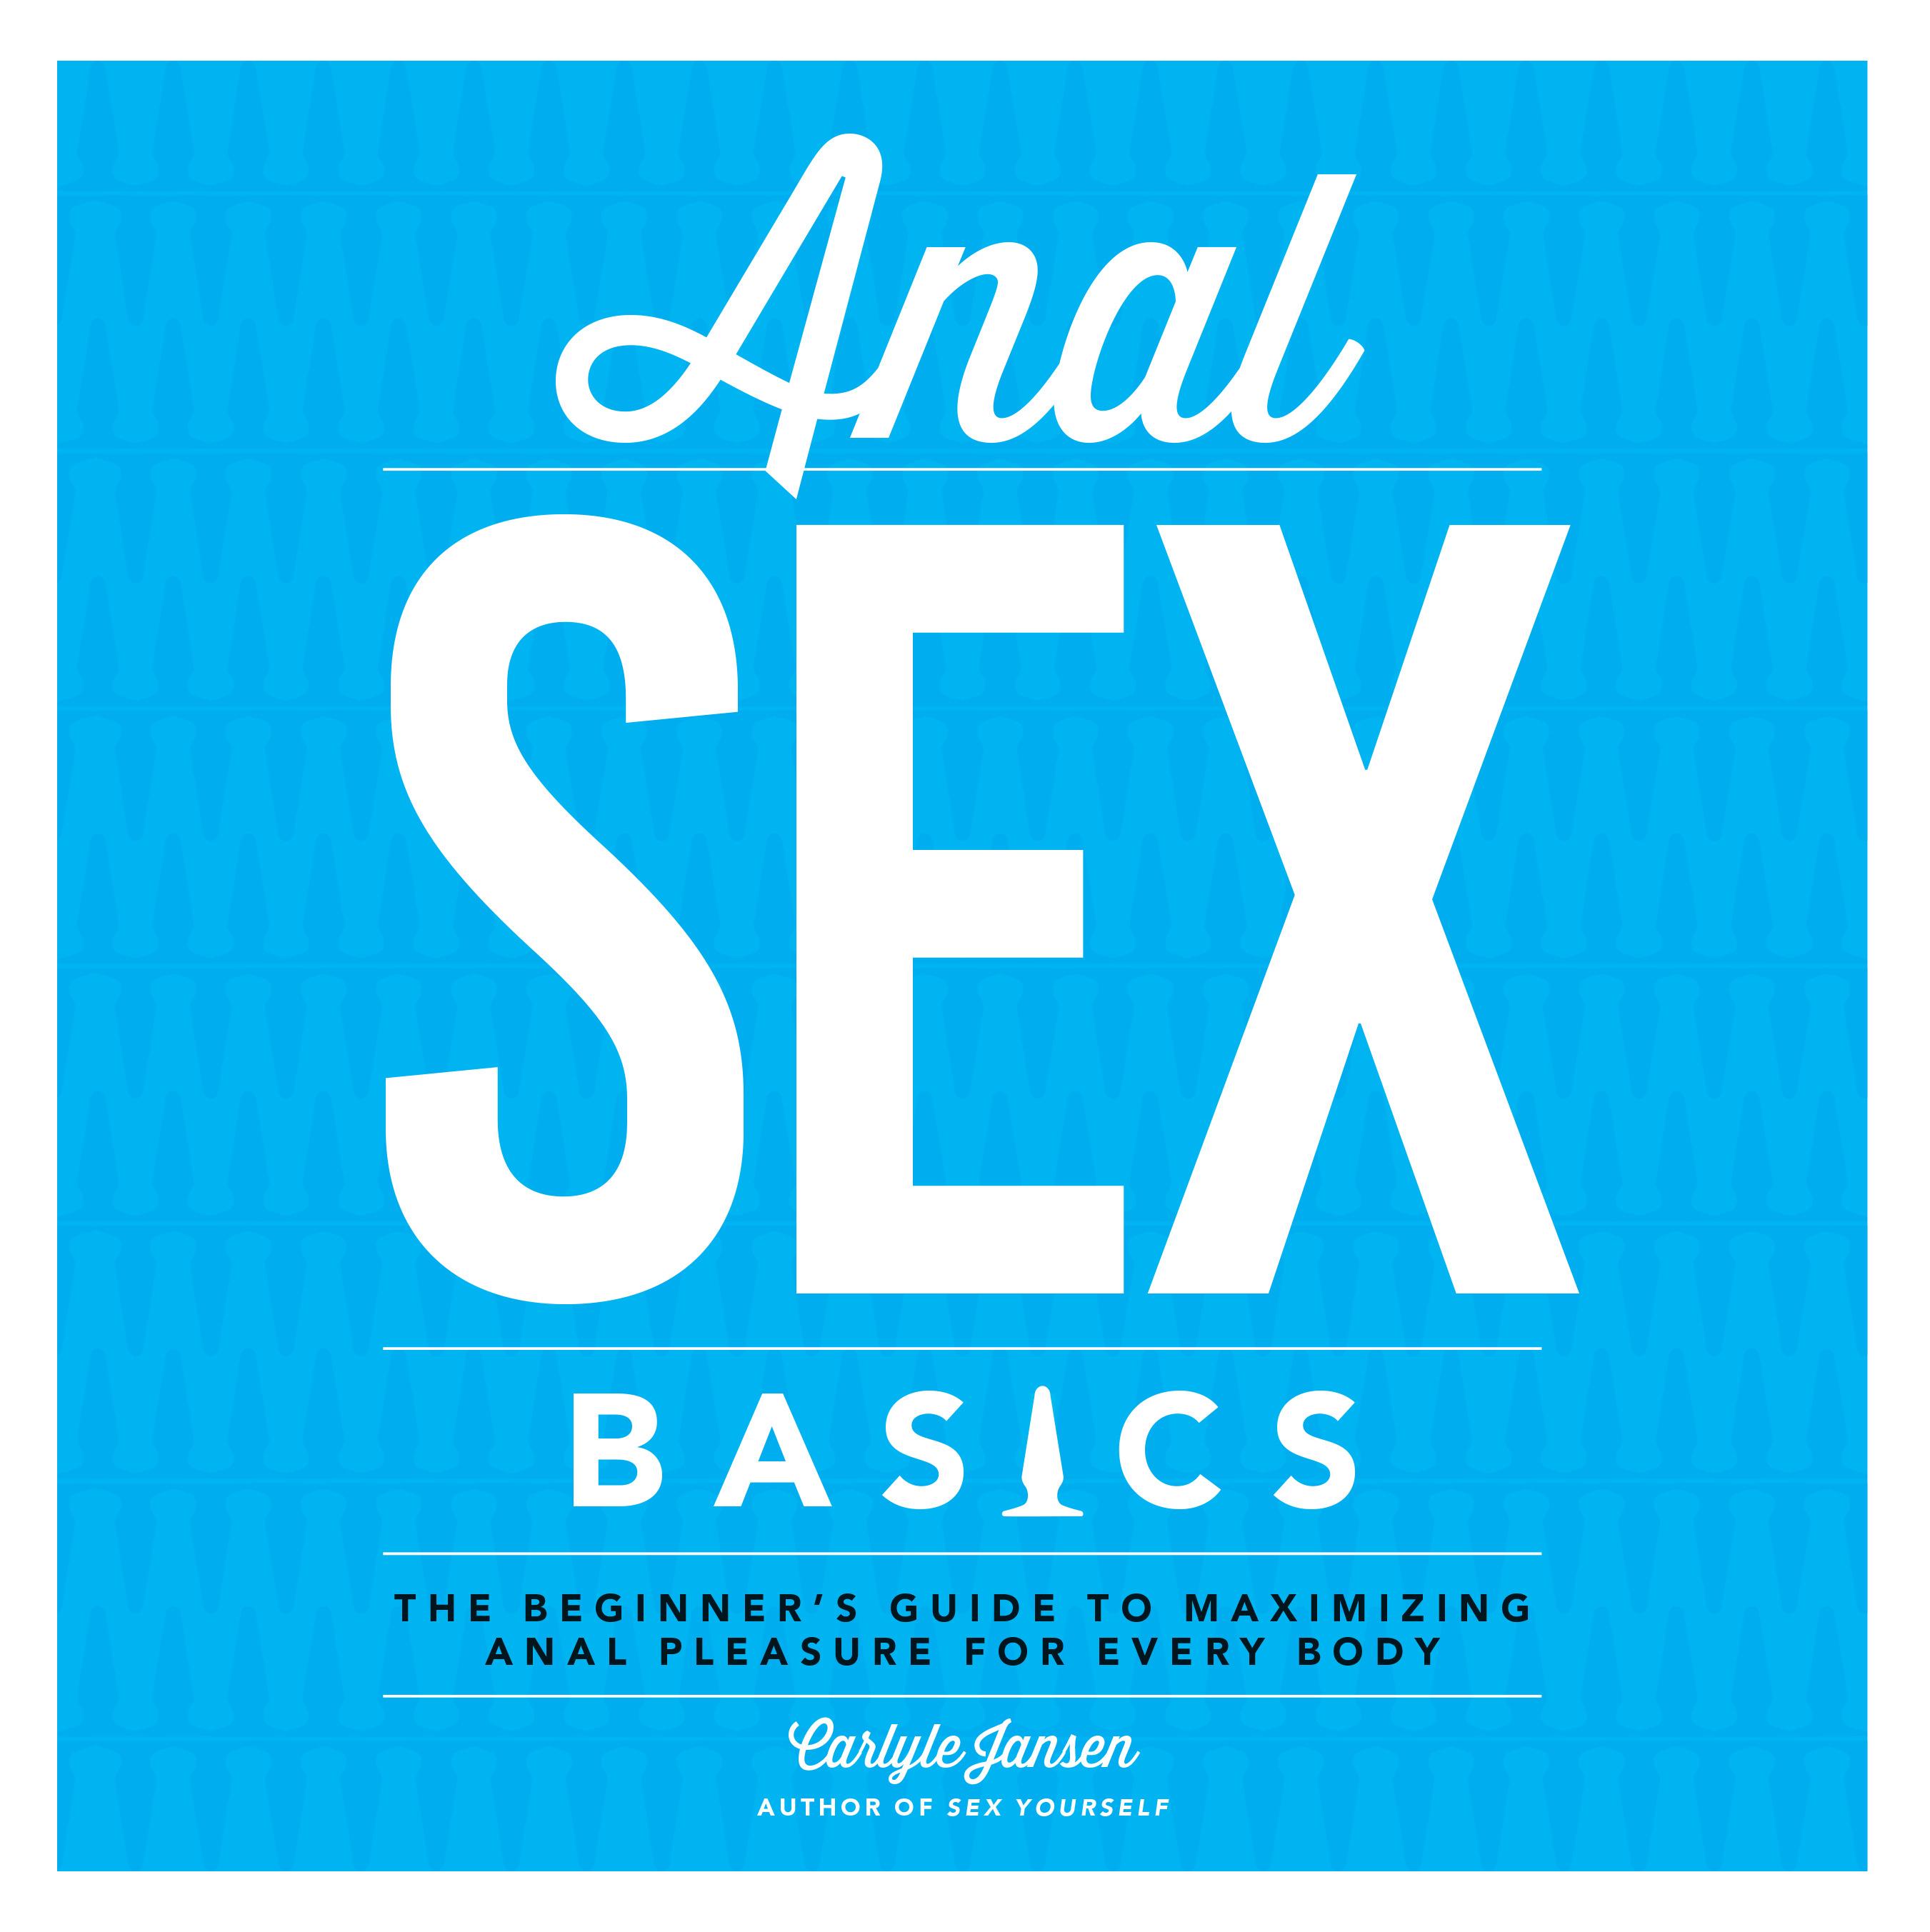 Тристан таормино expert guide to anal for men 23 фотография